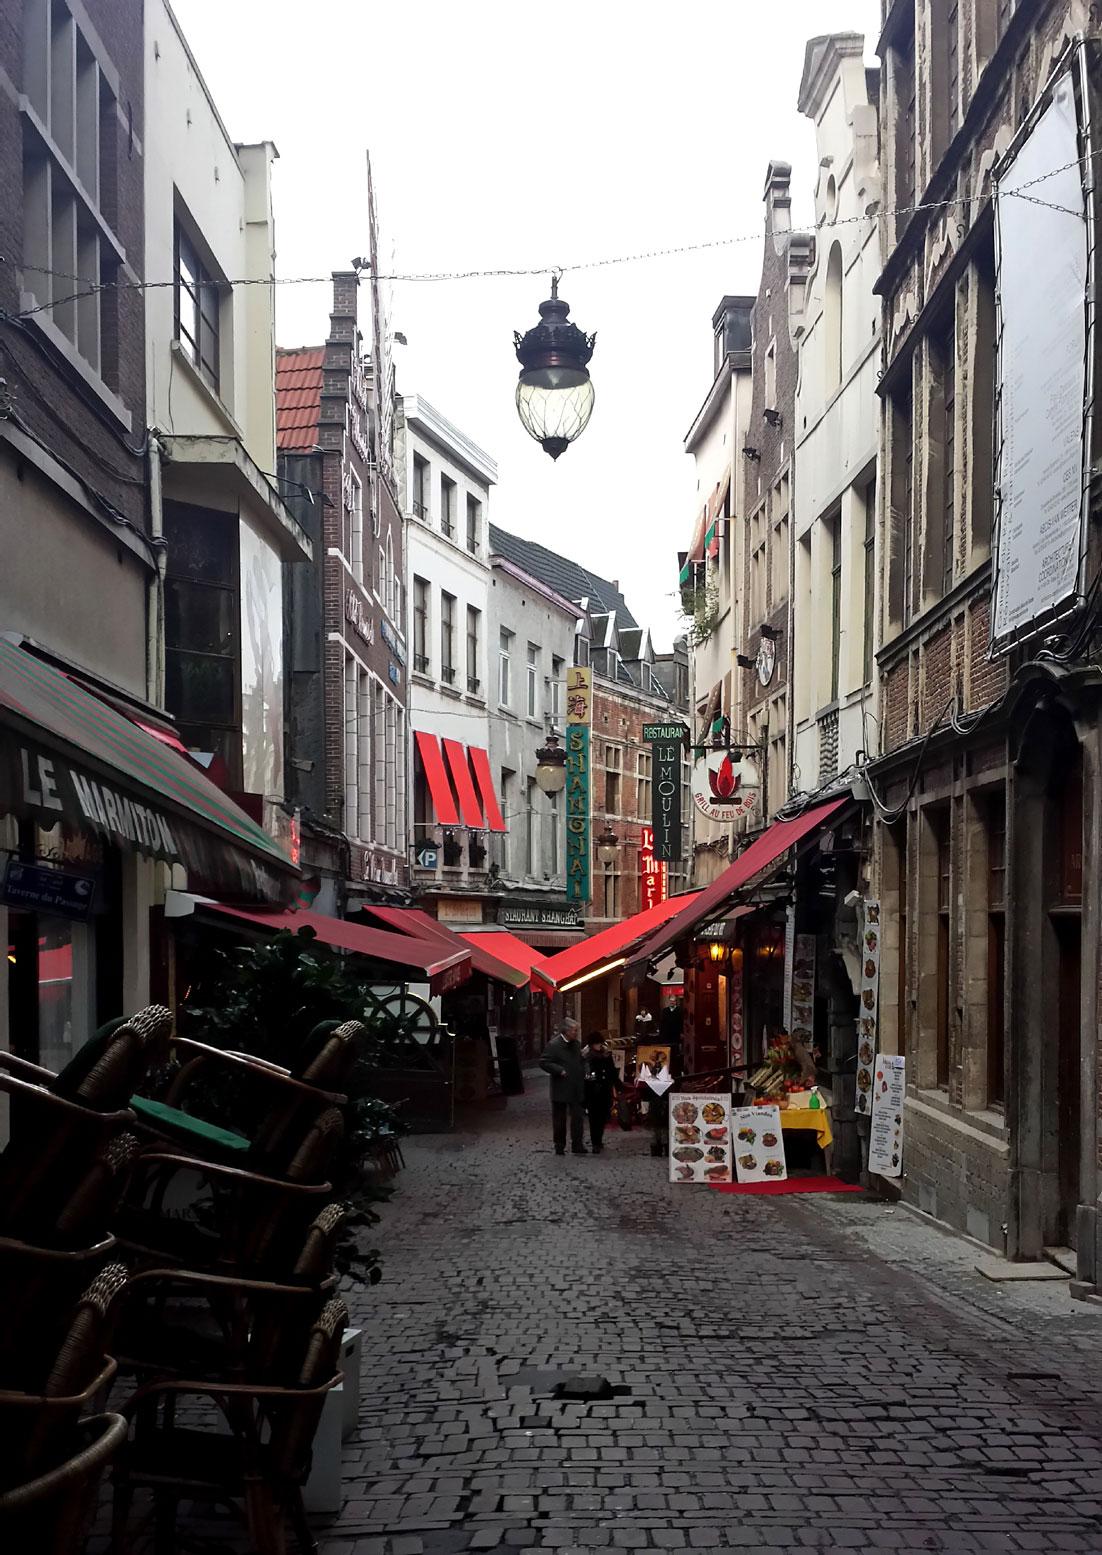 Brussels' side streets